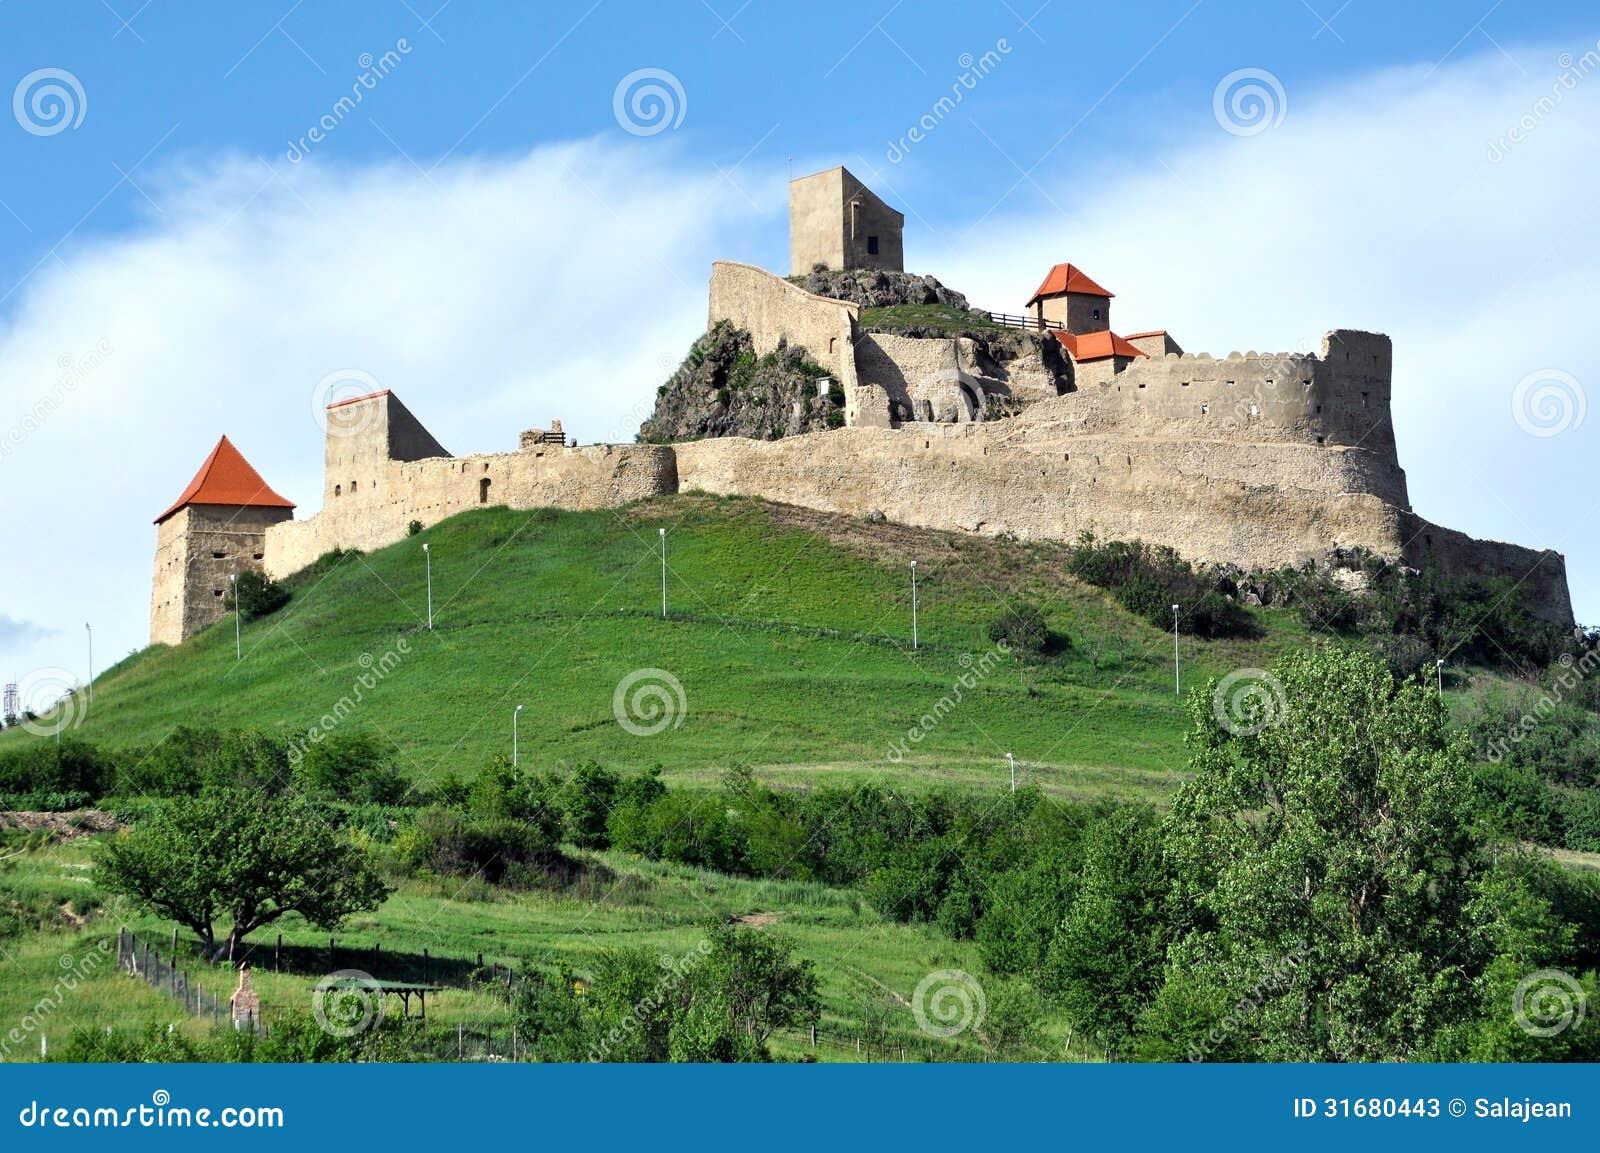 Castle Plans Rupea Fortress Romania Stock Photos Image 31680443